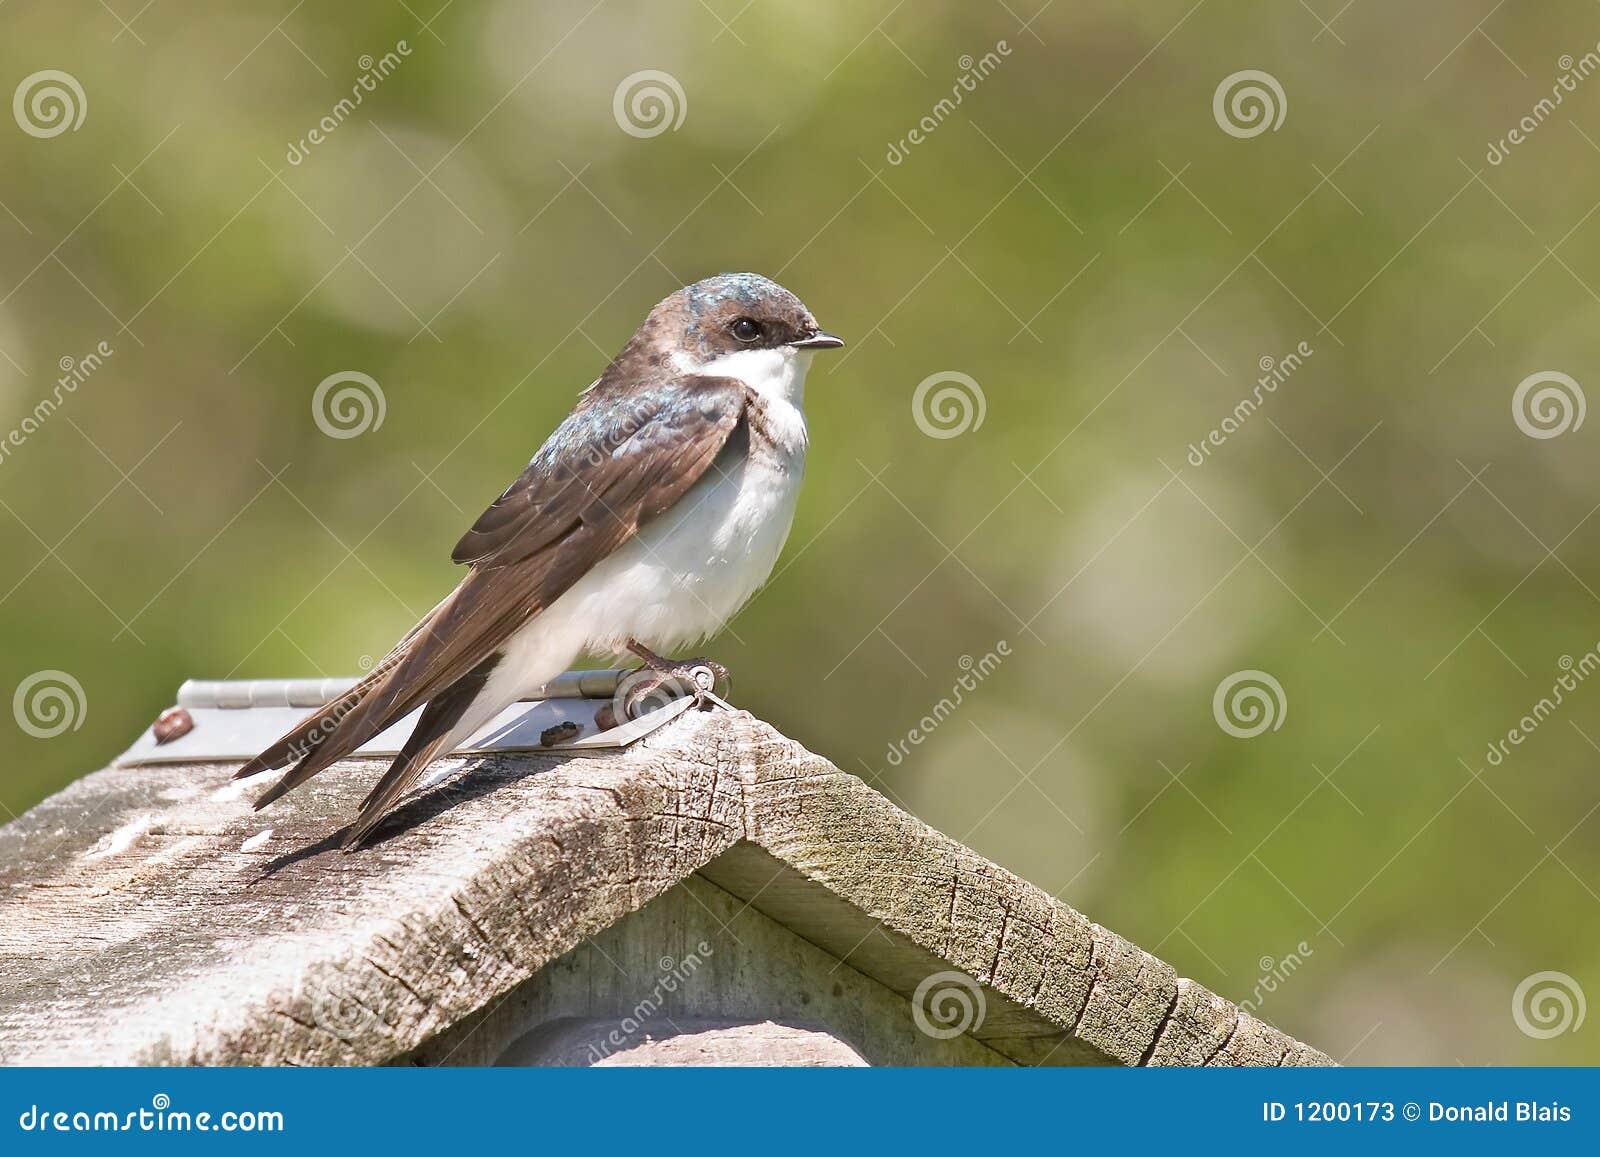 Tree Swallow_4760-1S